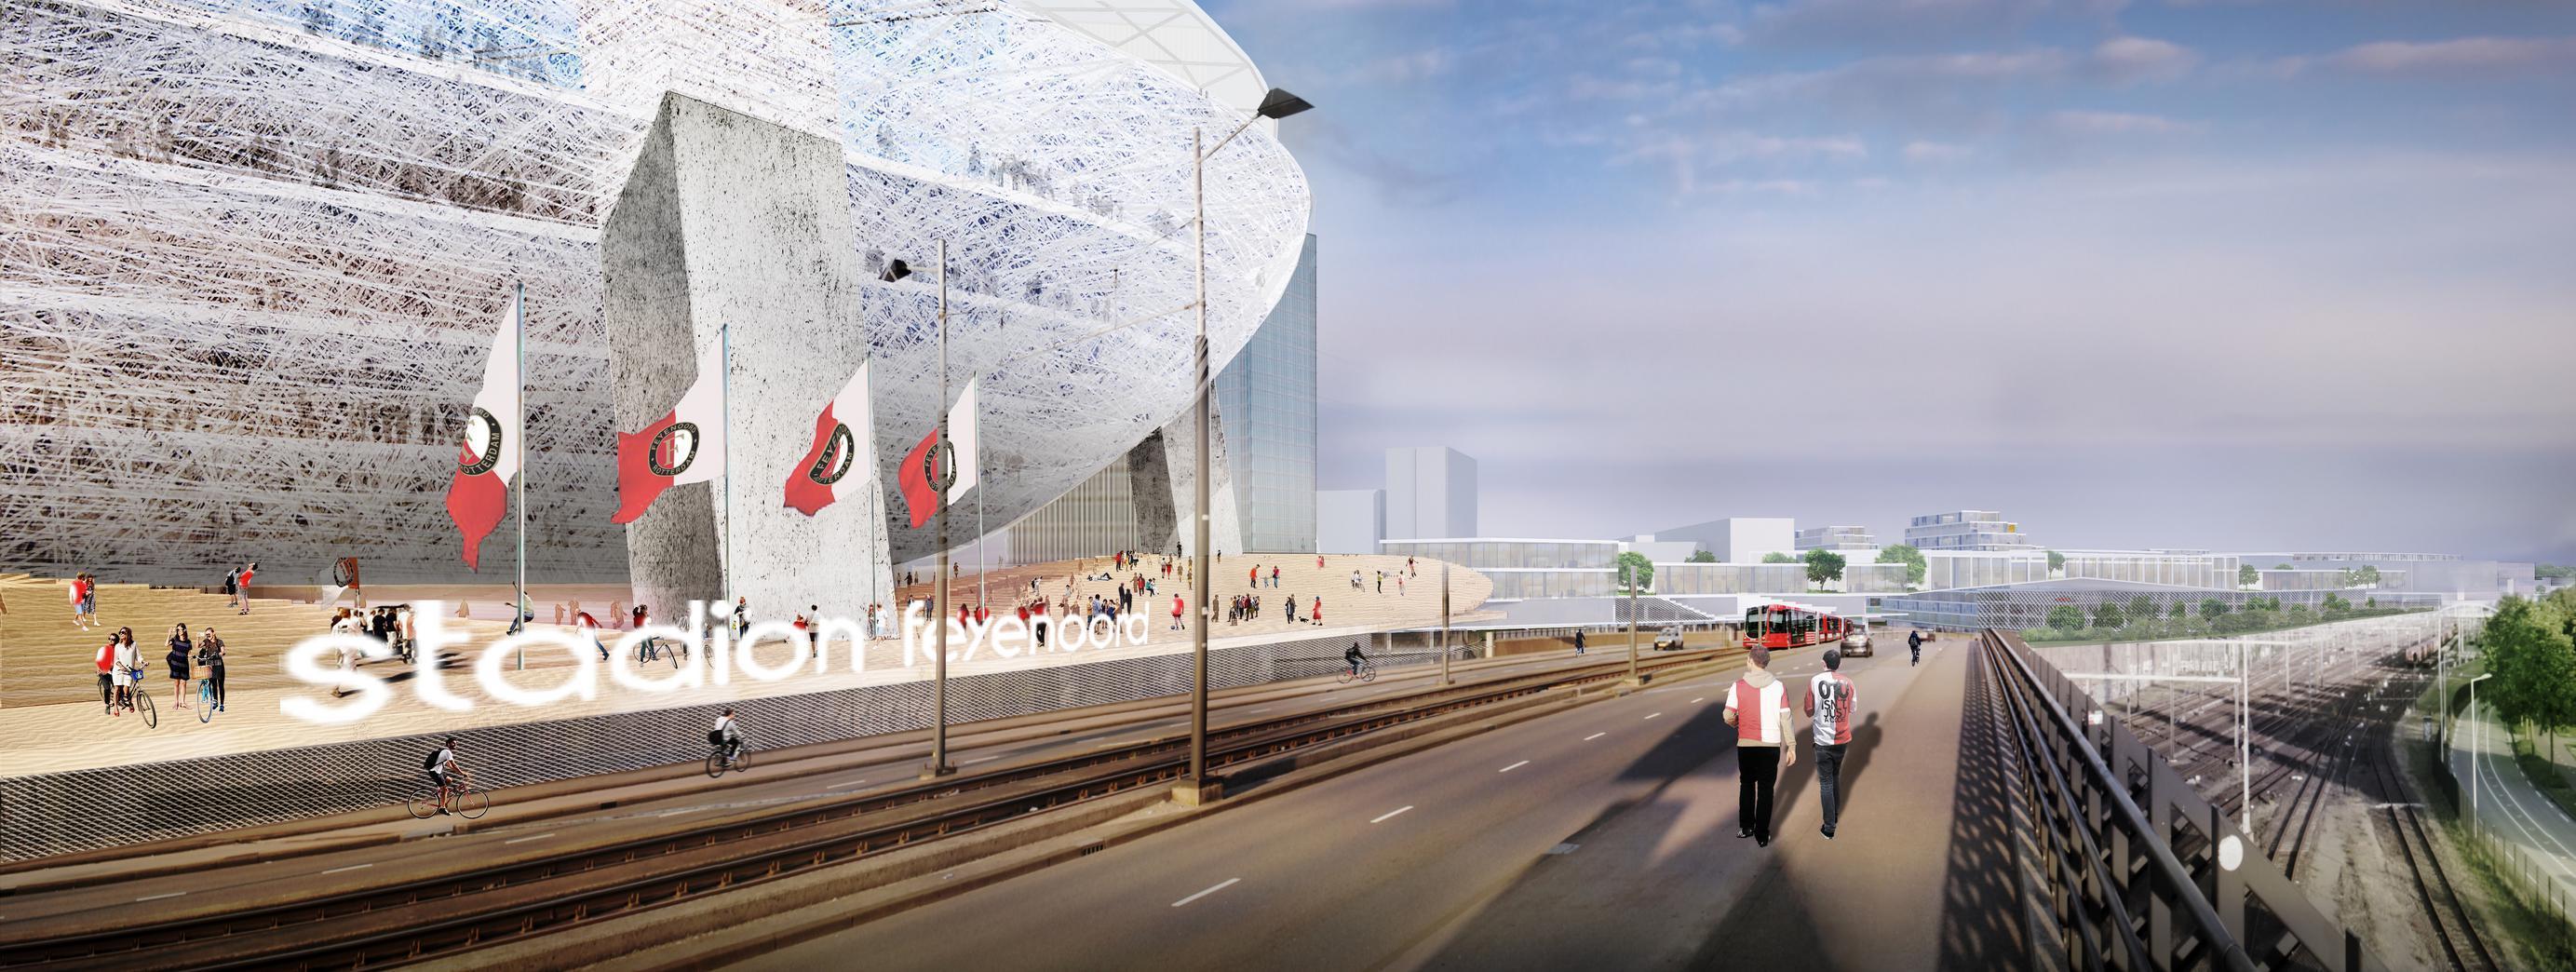 Nieuw Rotterdam Stadion